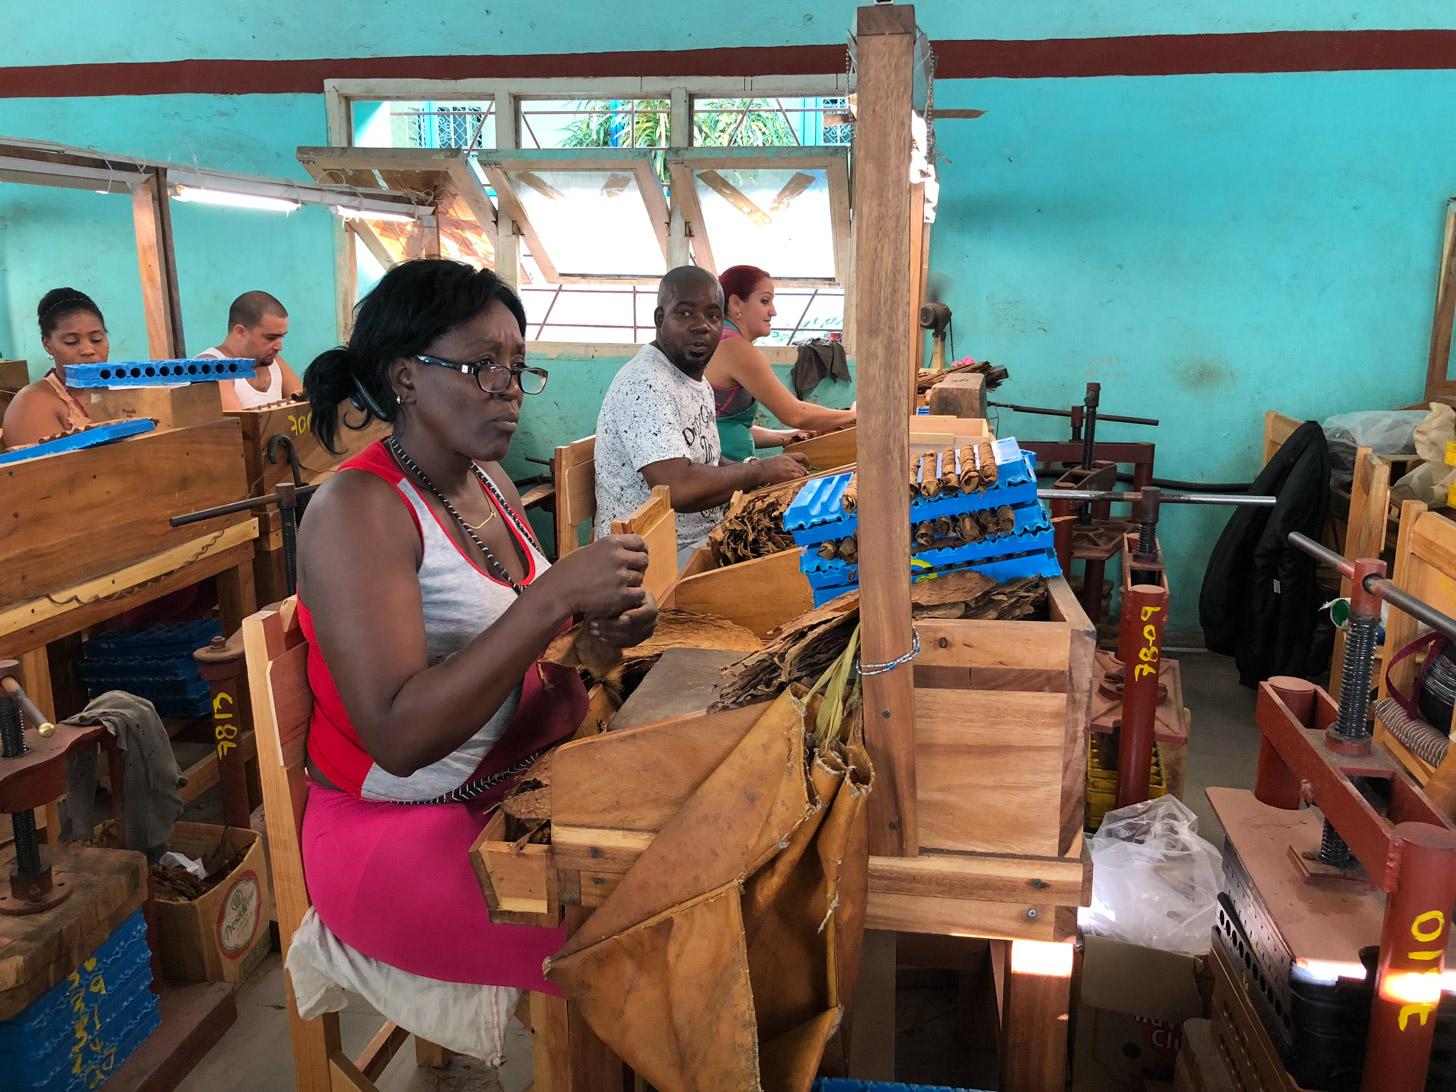 Sigarenfabriek in Pinar del Rio